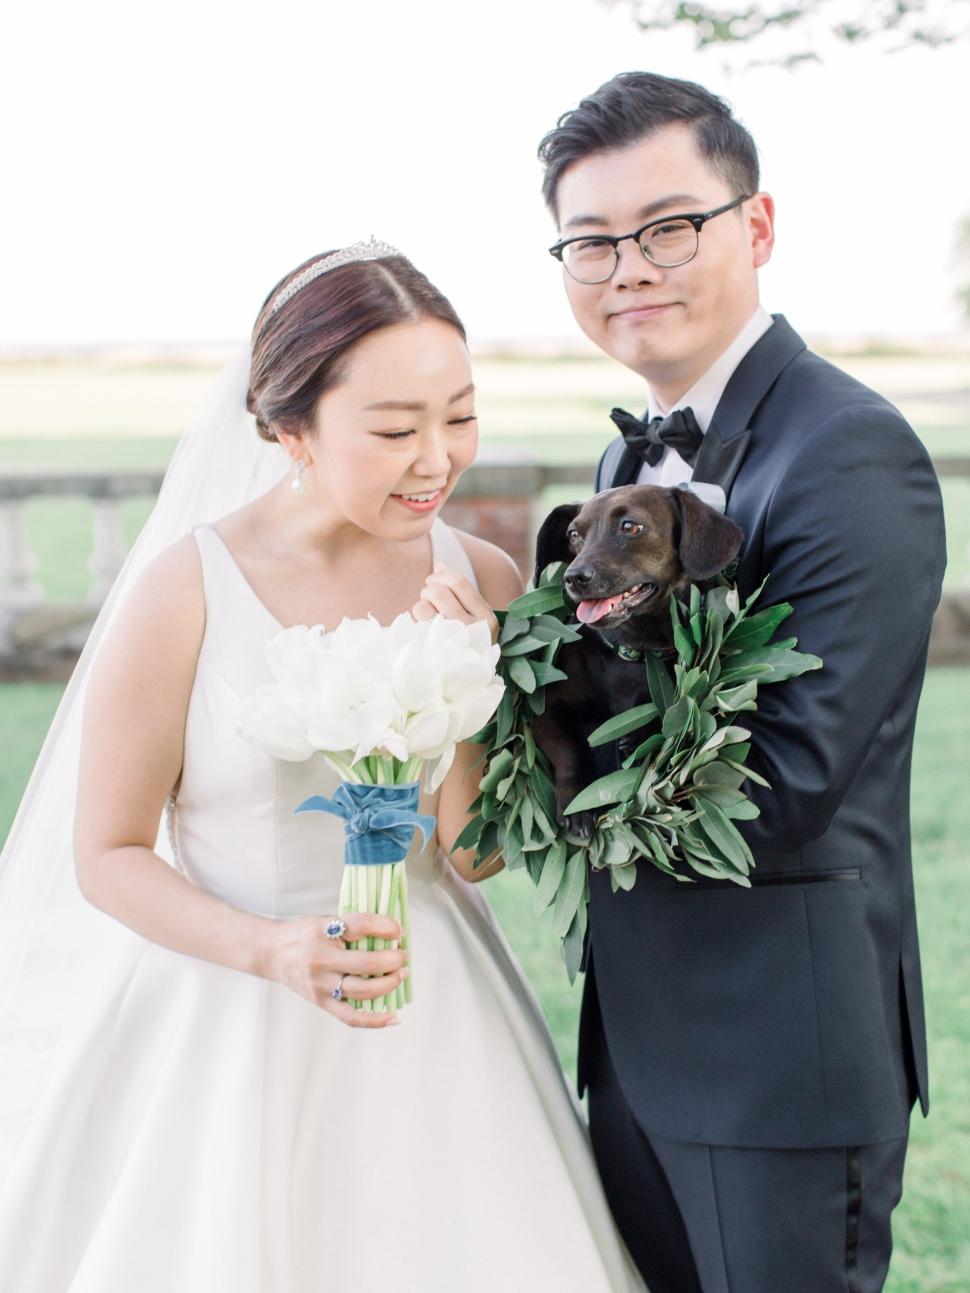 Bourne-Mansion-Wedding-Photos-Cassi-Claire-Long-Island-Wedding-Photographer_32.jpg